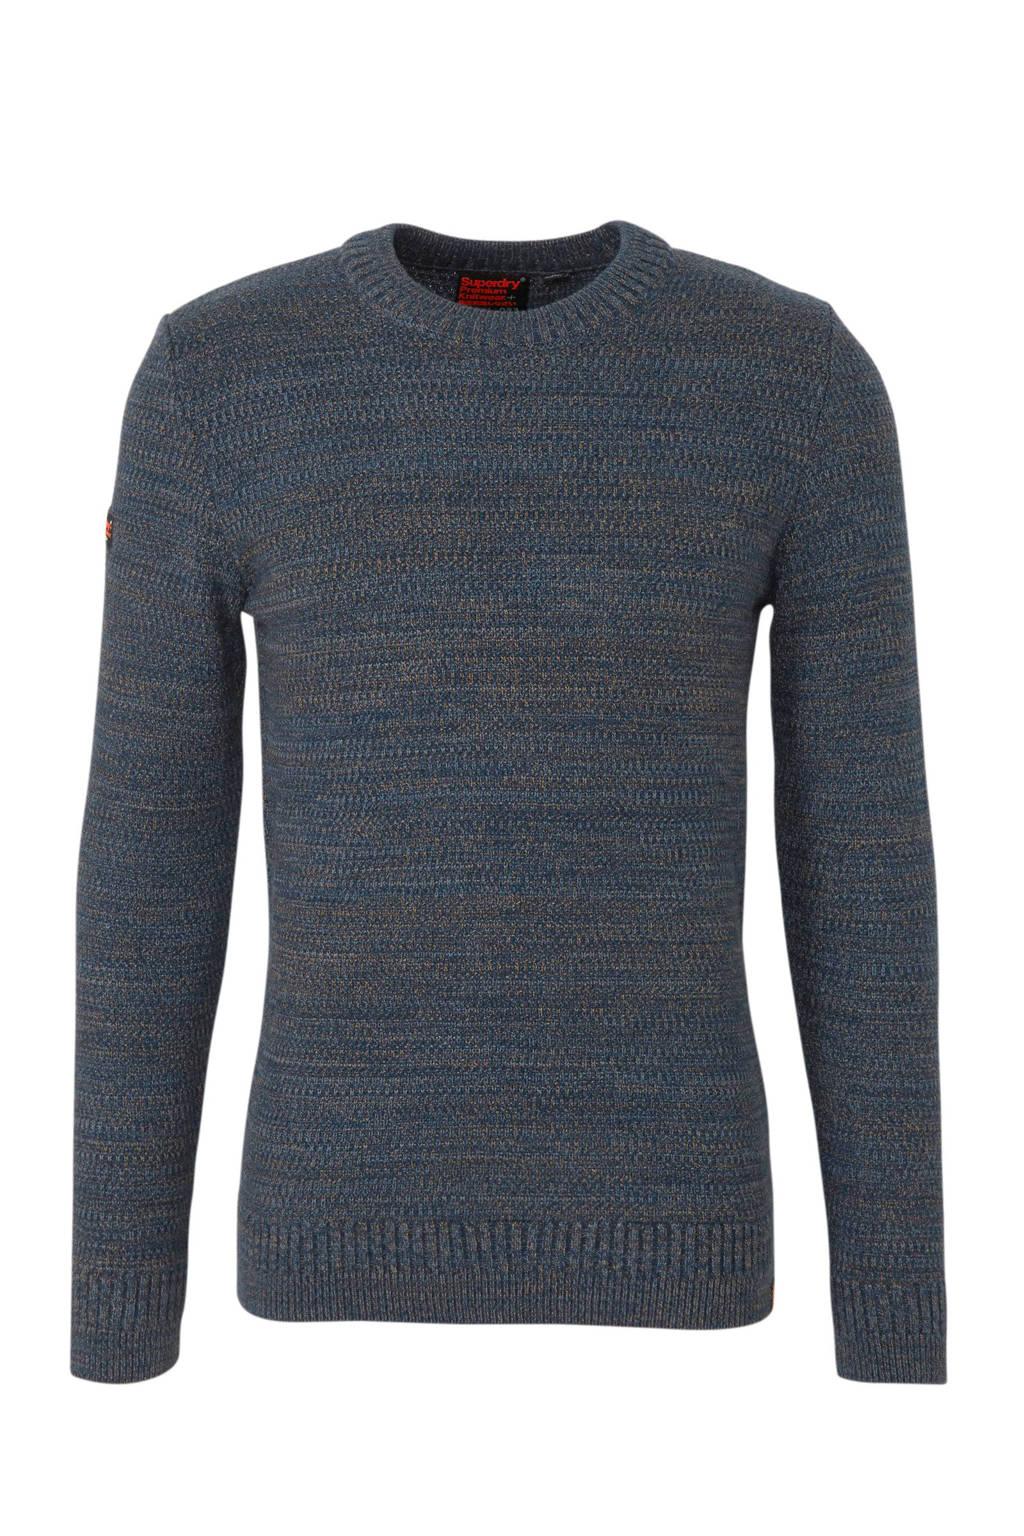 Superdry gemêleerde trui blauw, Blauw